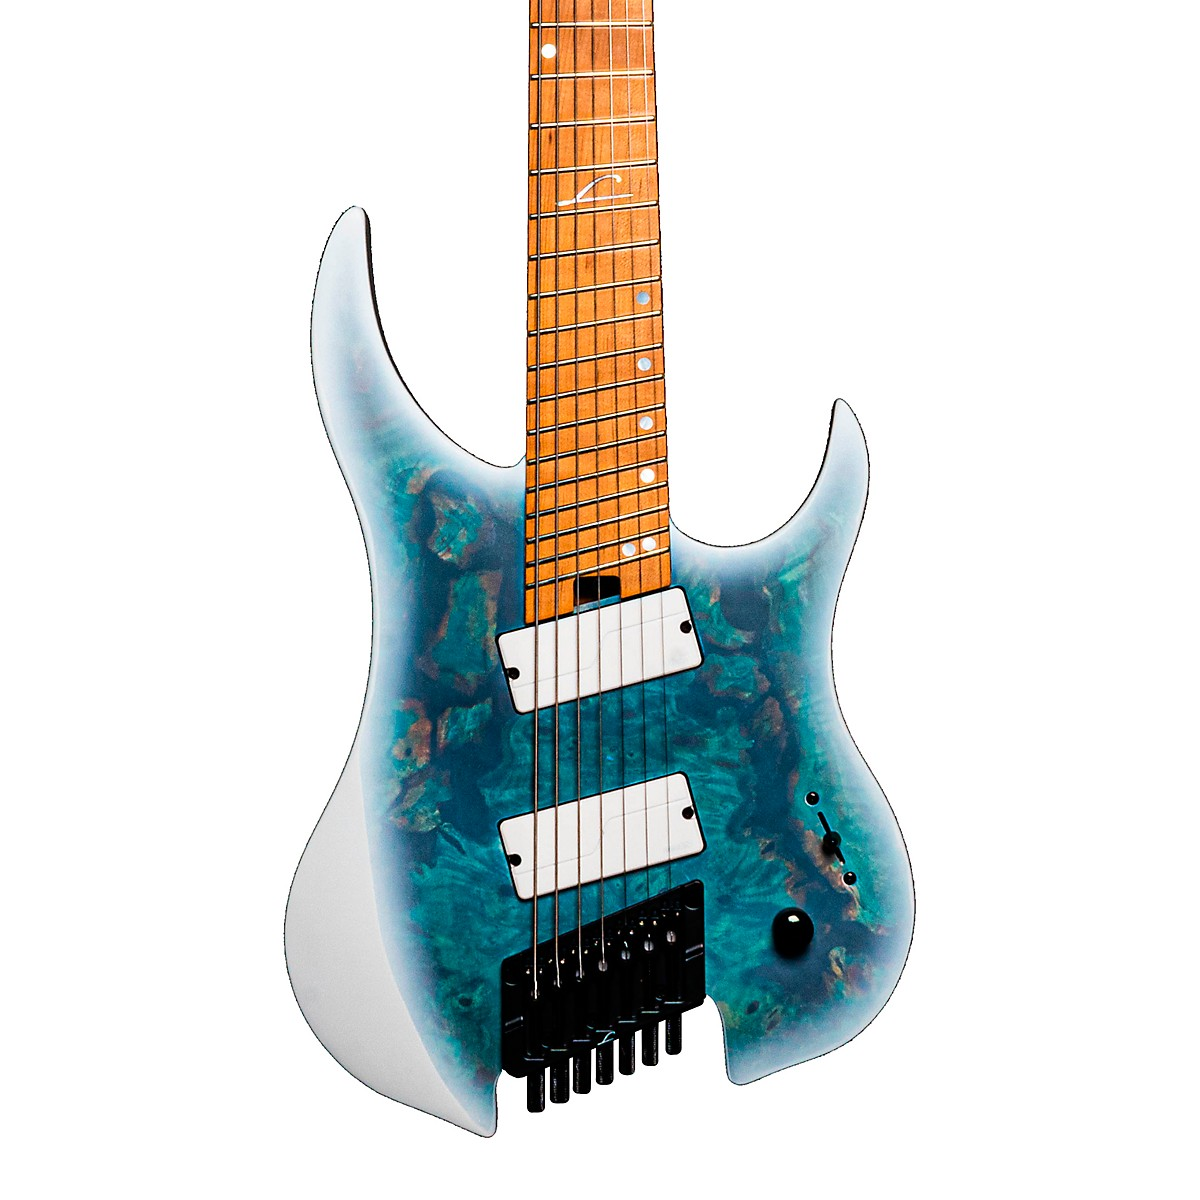 Legator G7FOD Ghost Overdrive 7 Multi-Scale Electric Guitar